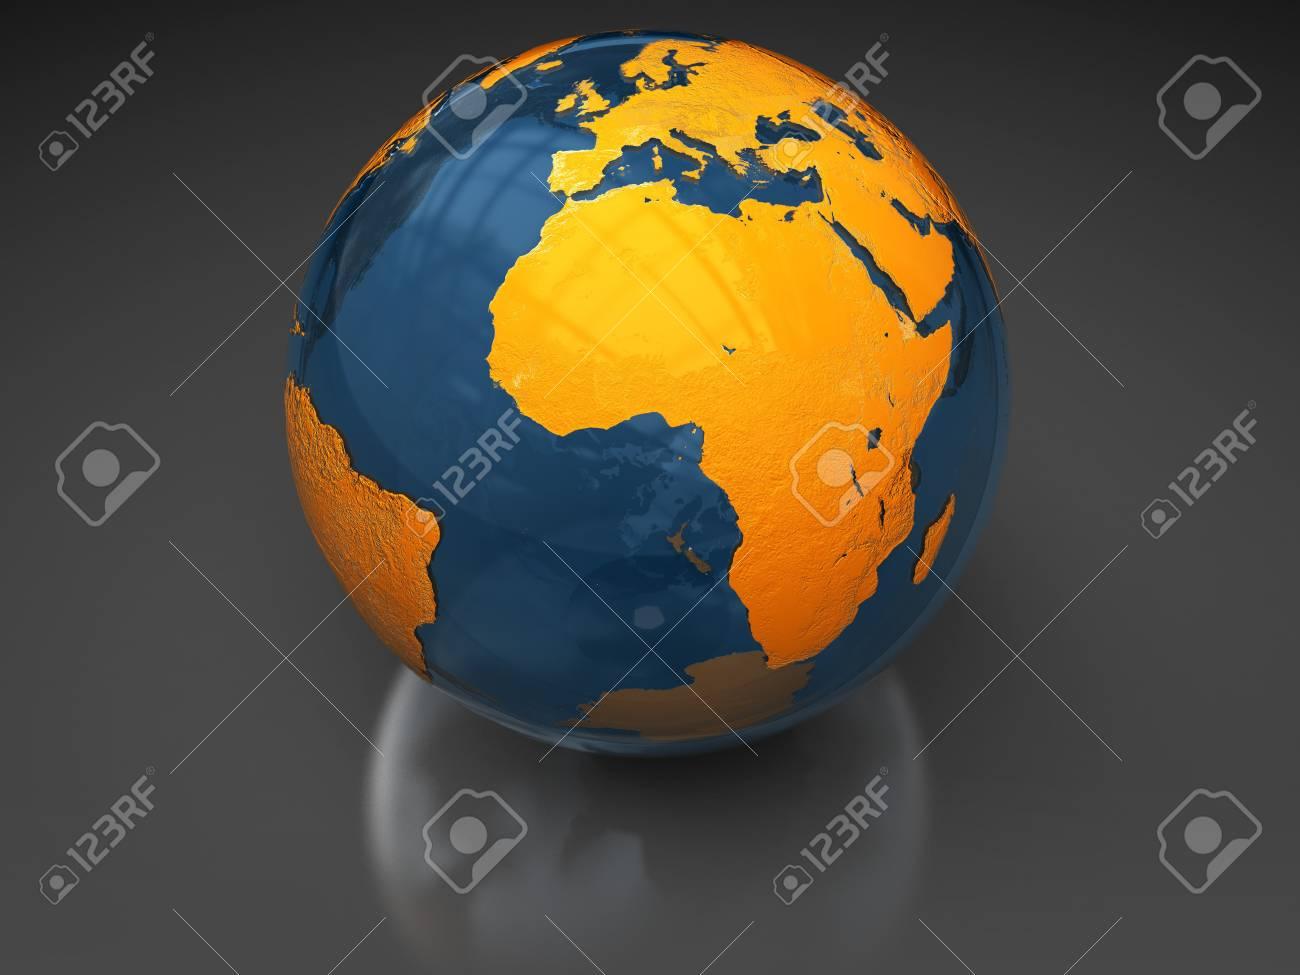 abstract 3d illustration of glass earth globe over dark background Stock Illustration - 6754625